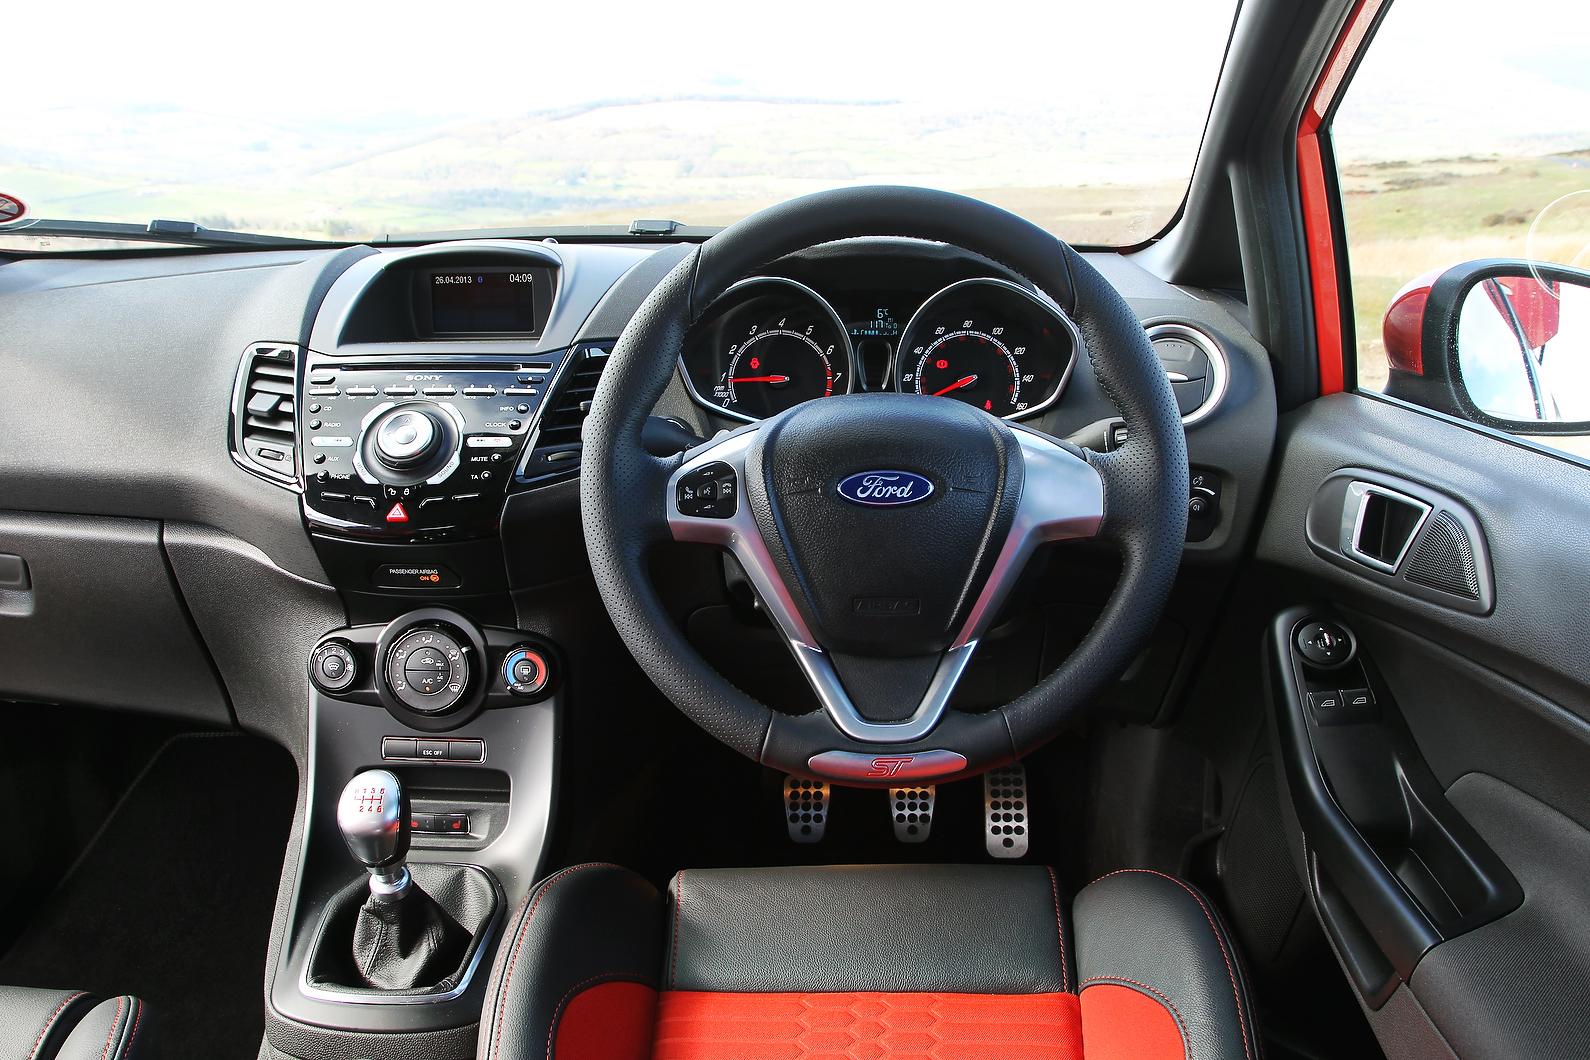 Descubrir Masculinidad resbalón  Ford Fiesta ST 2012-2017 Review (2021) | Autocar